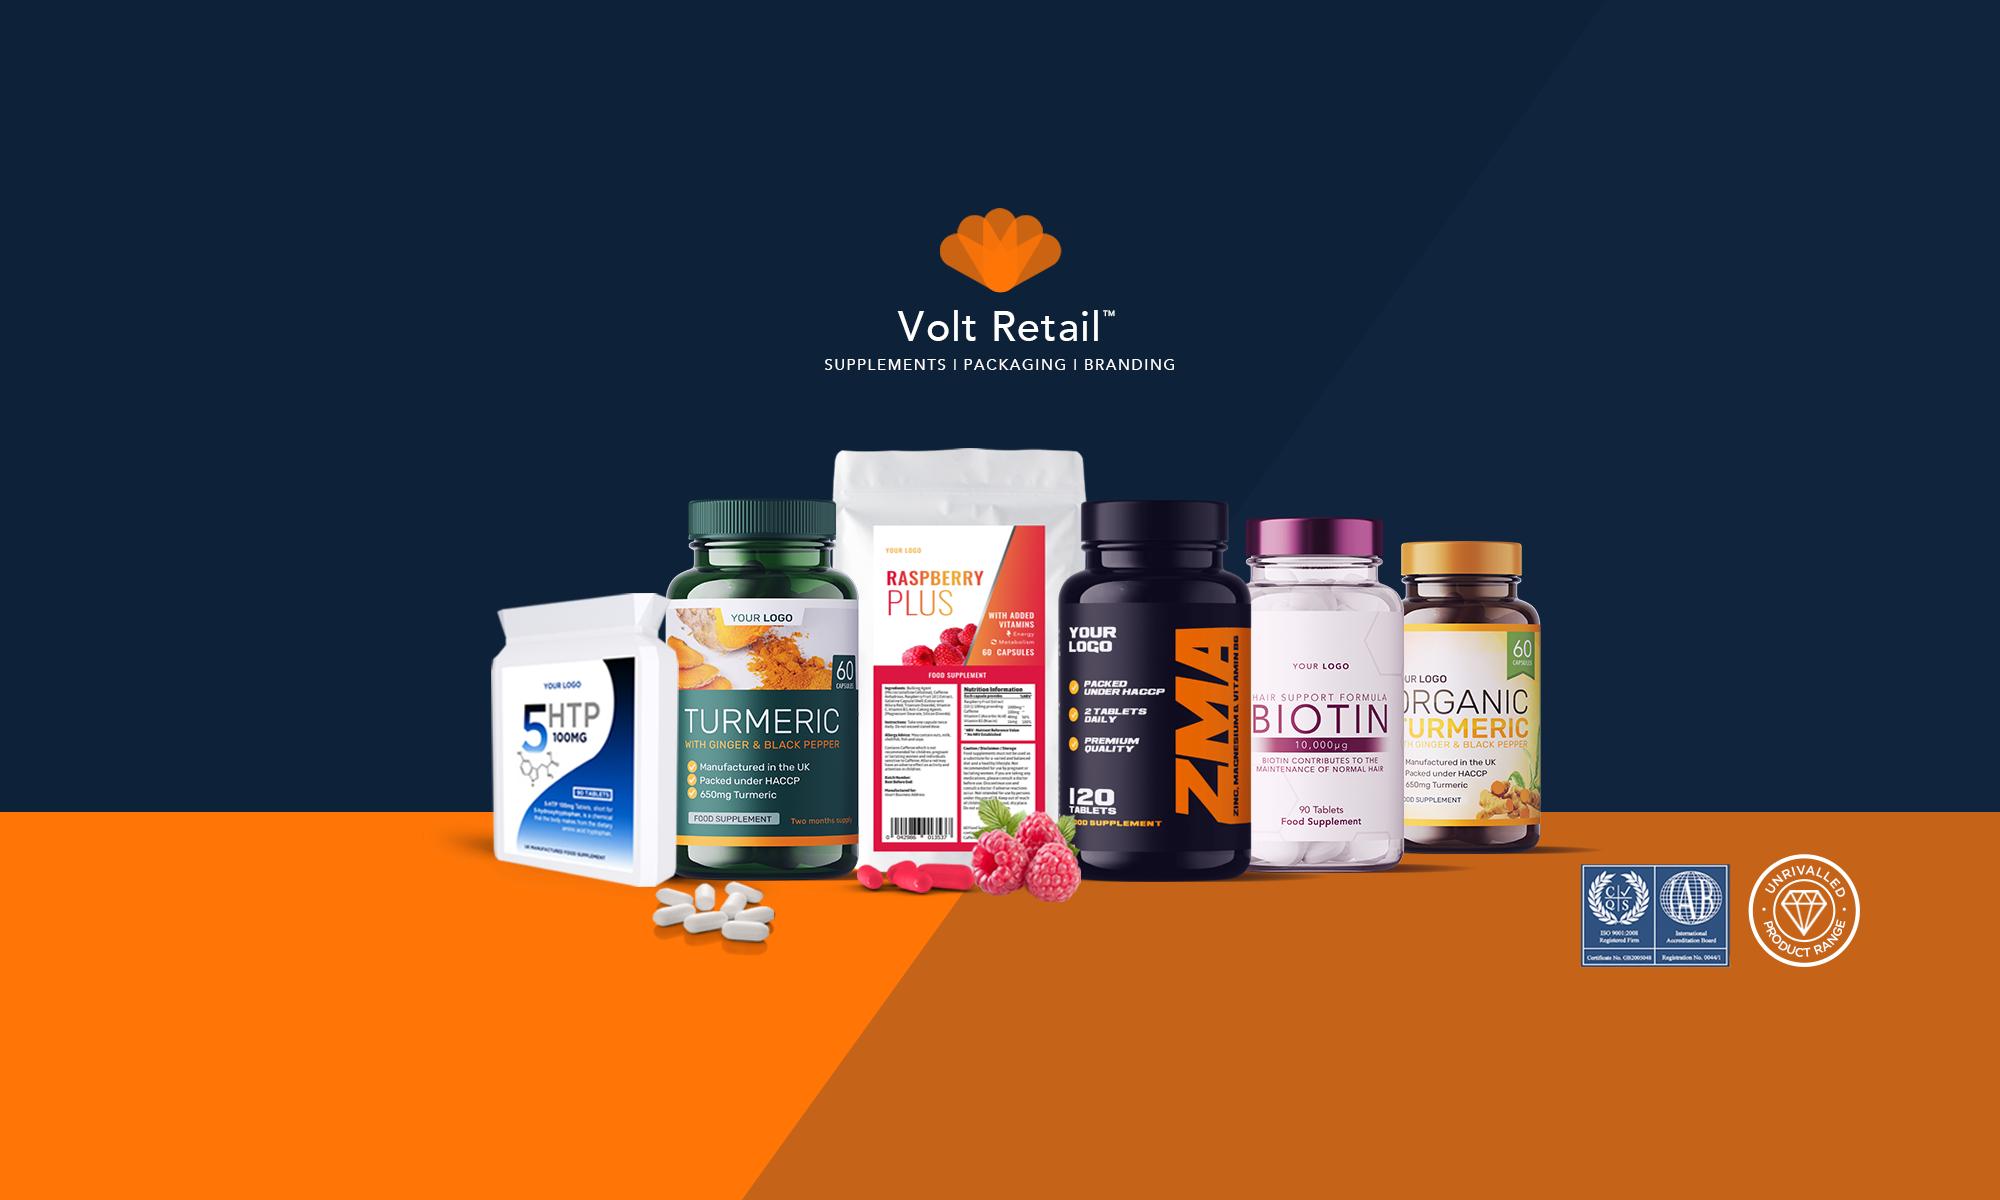 Volt Retail Ltd